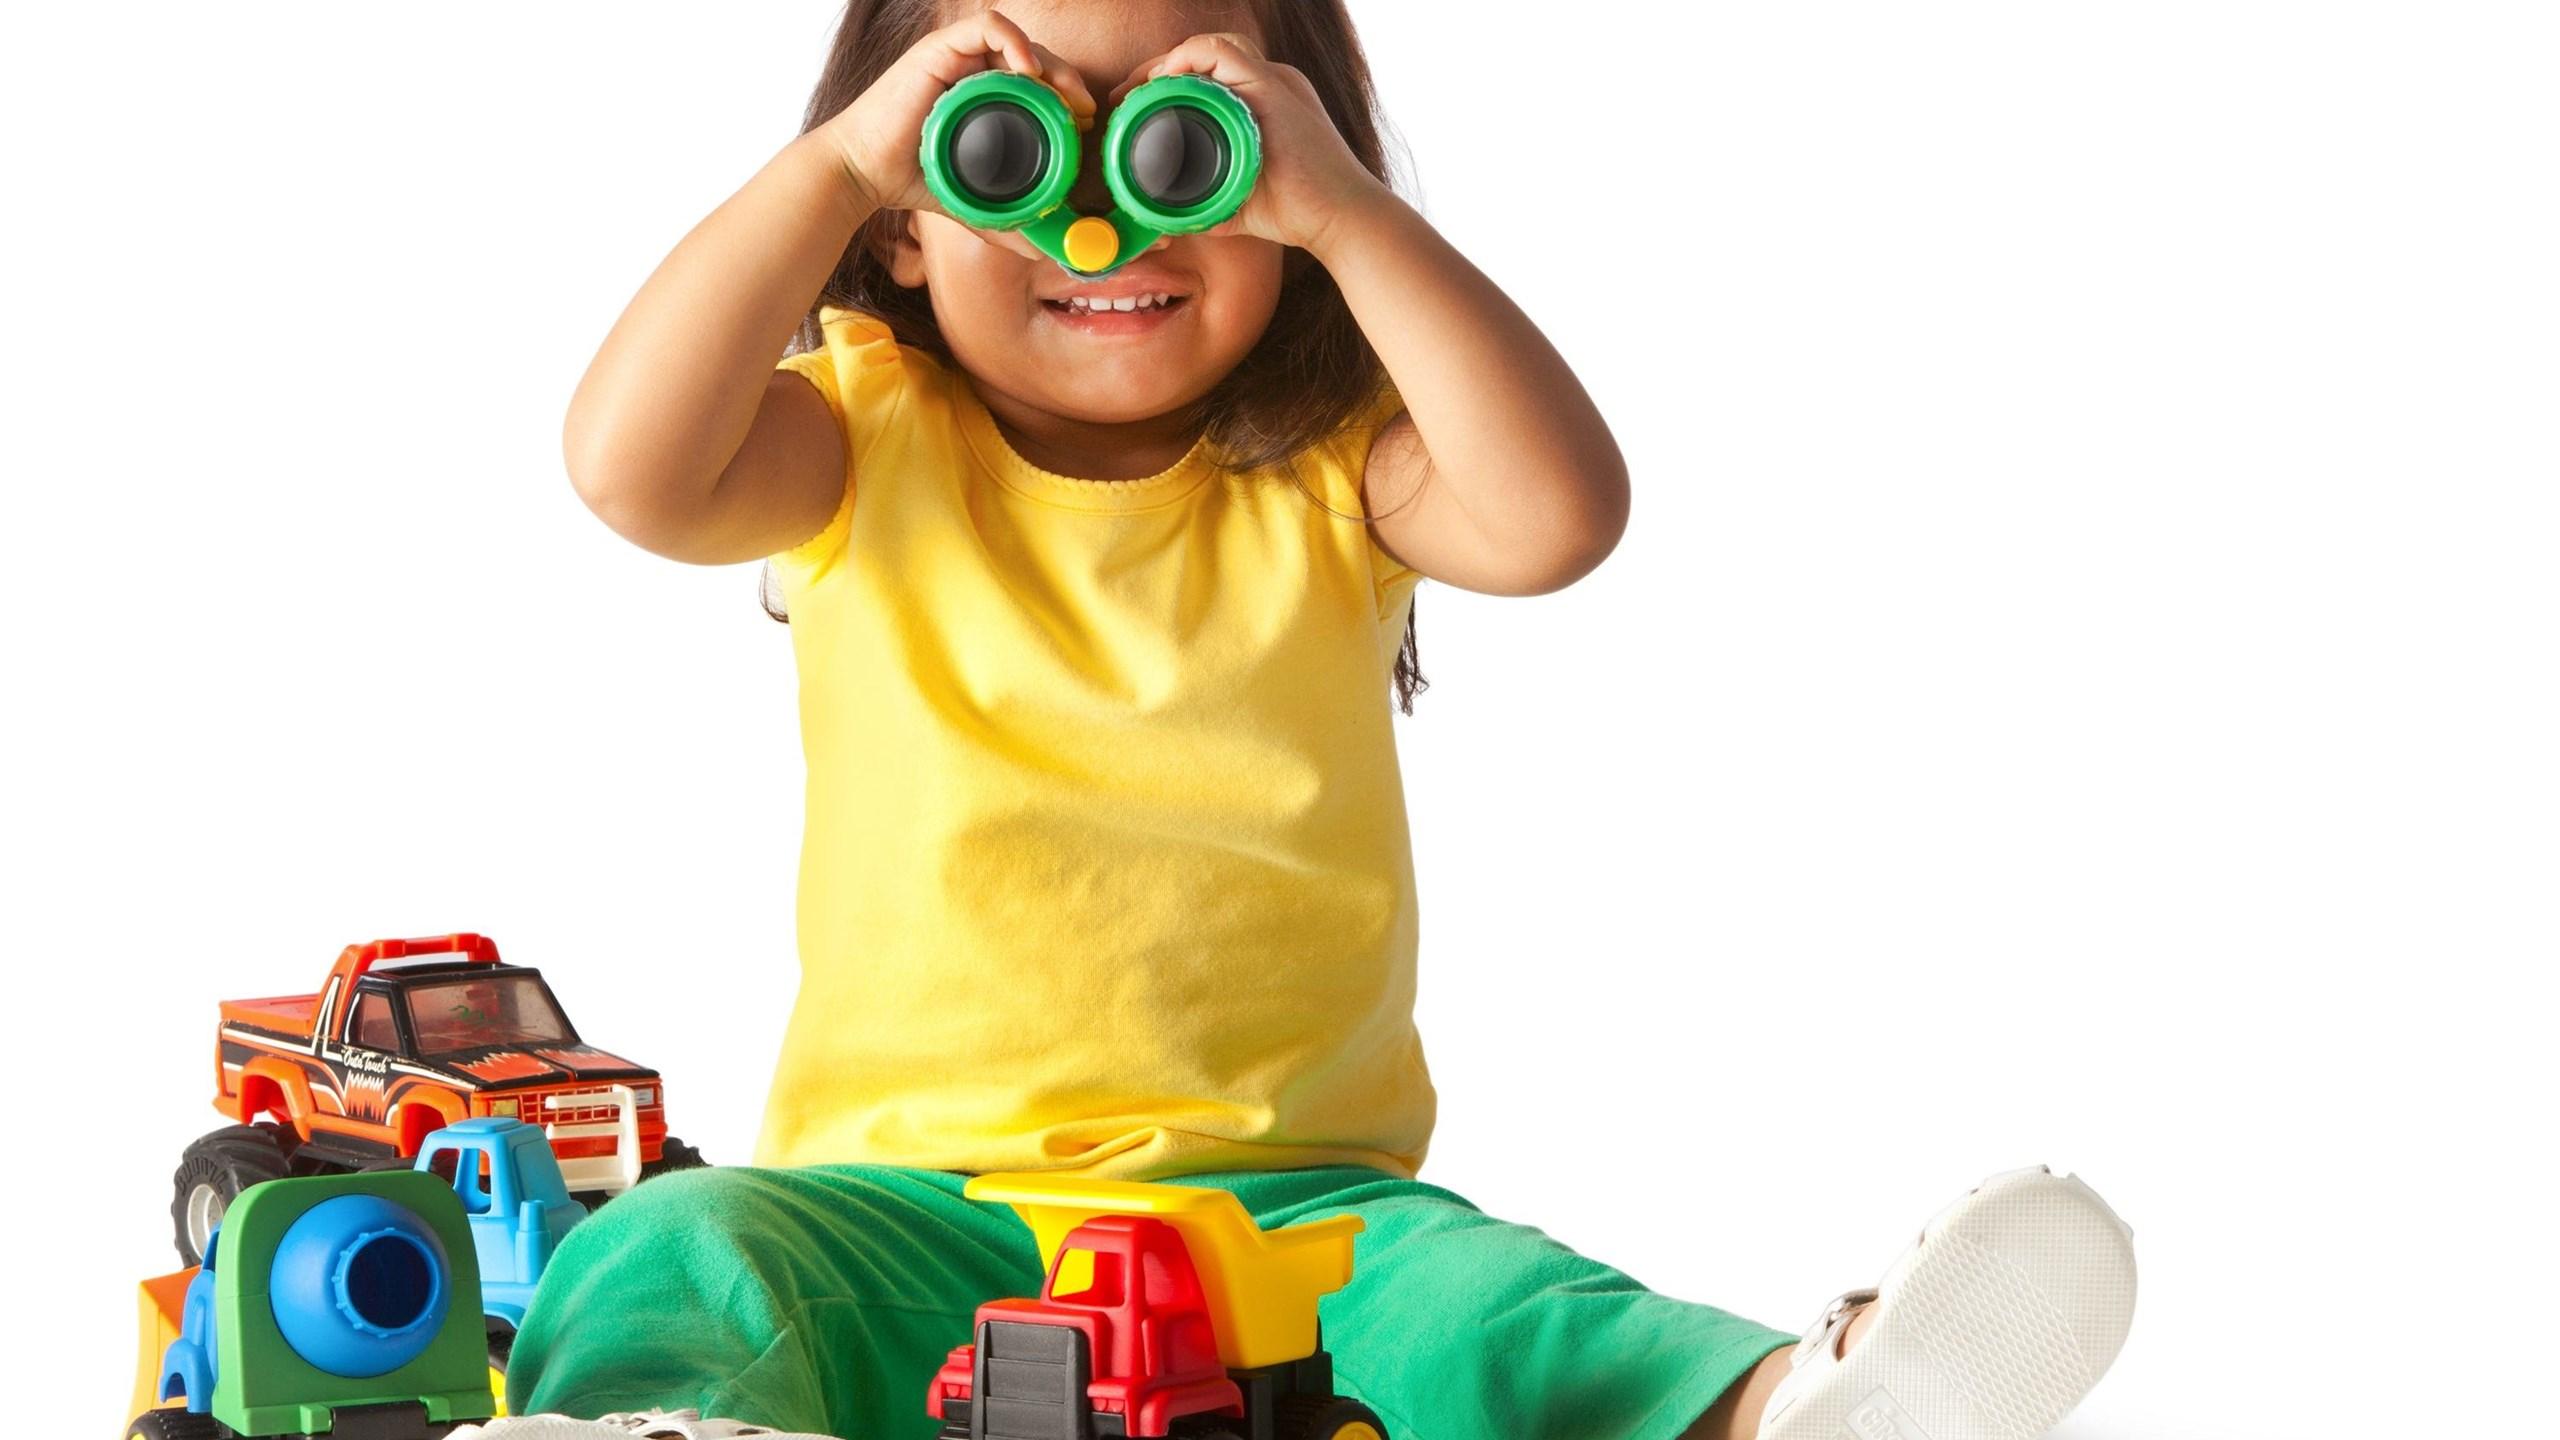 Kids Toys Wallpapers Download Free Kids Toys Kids Toys Hd